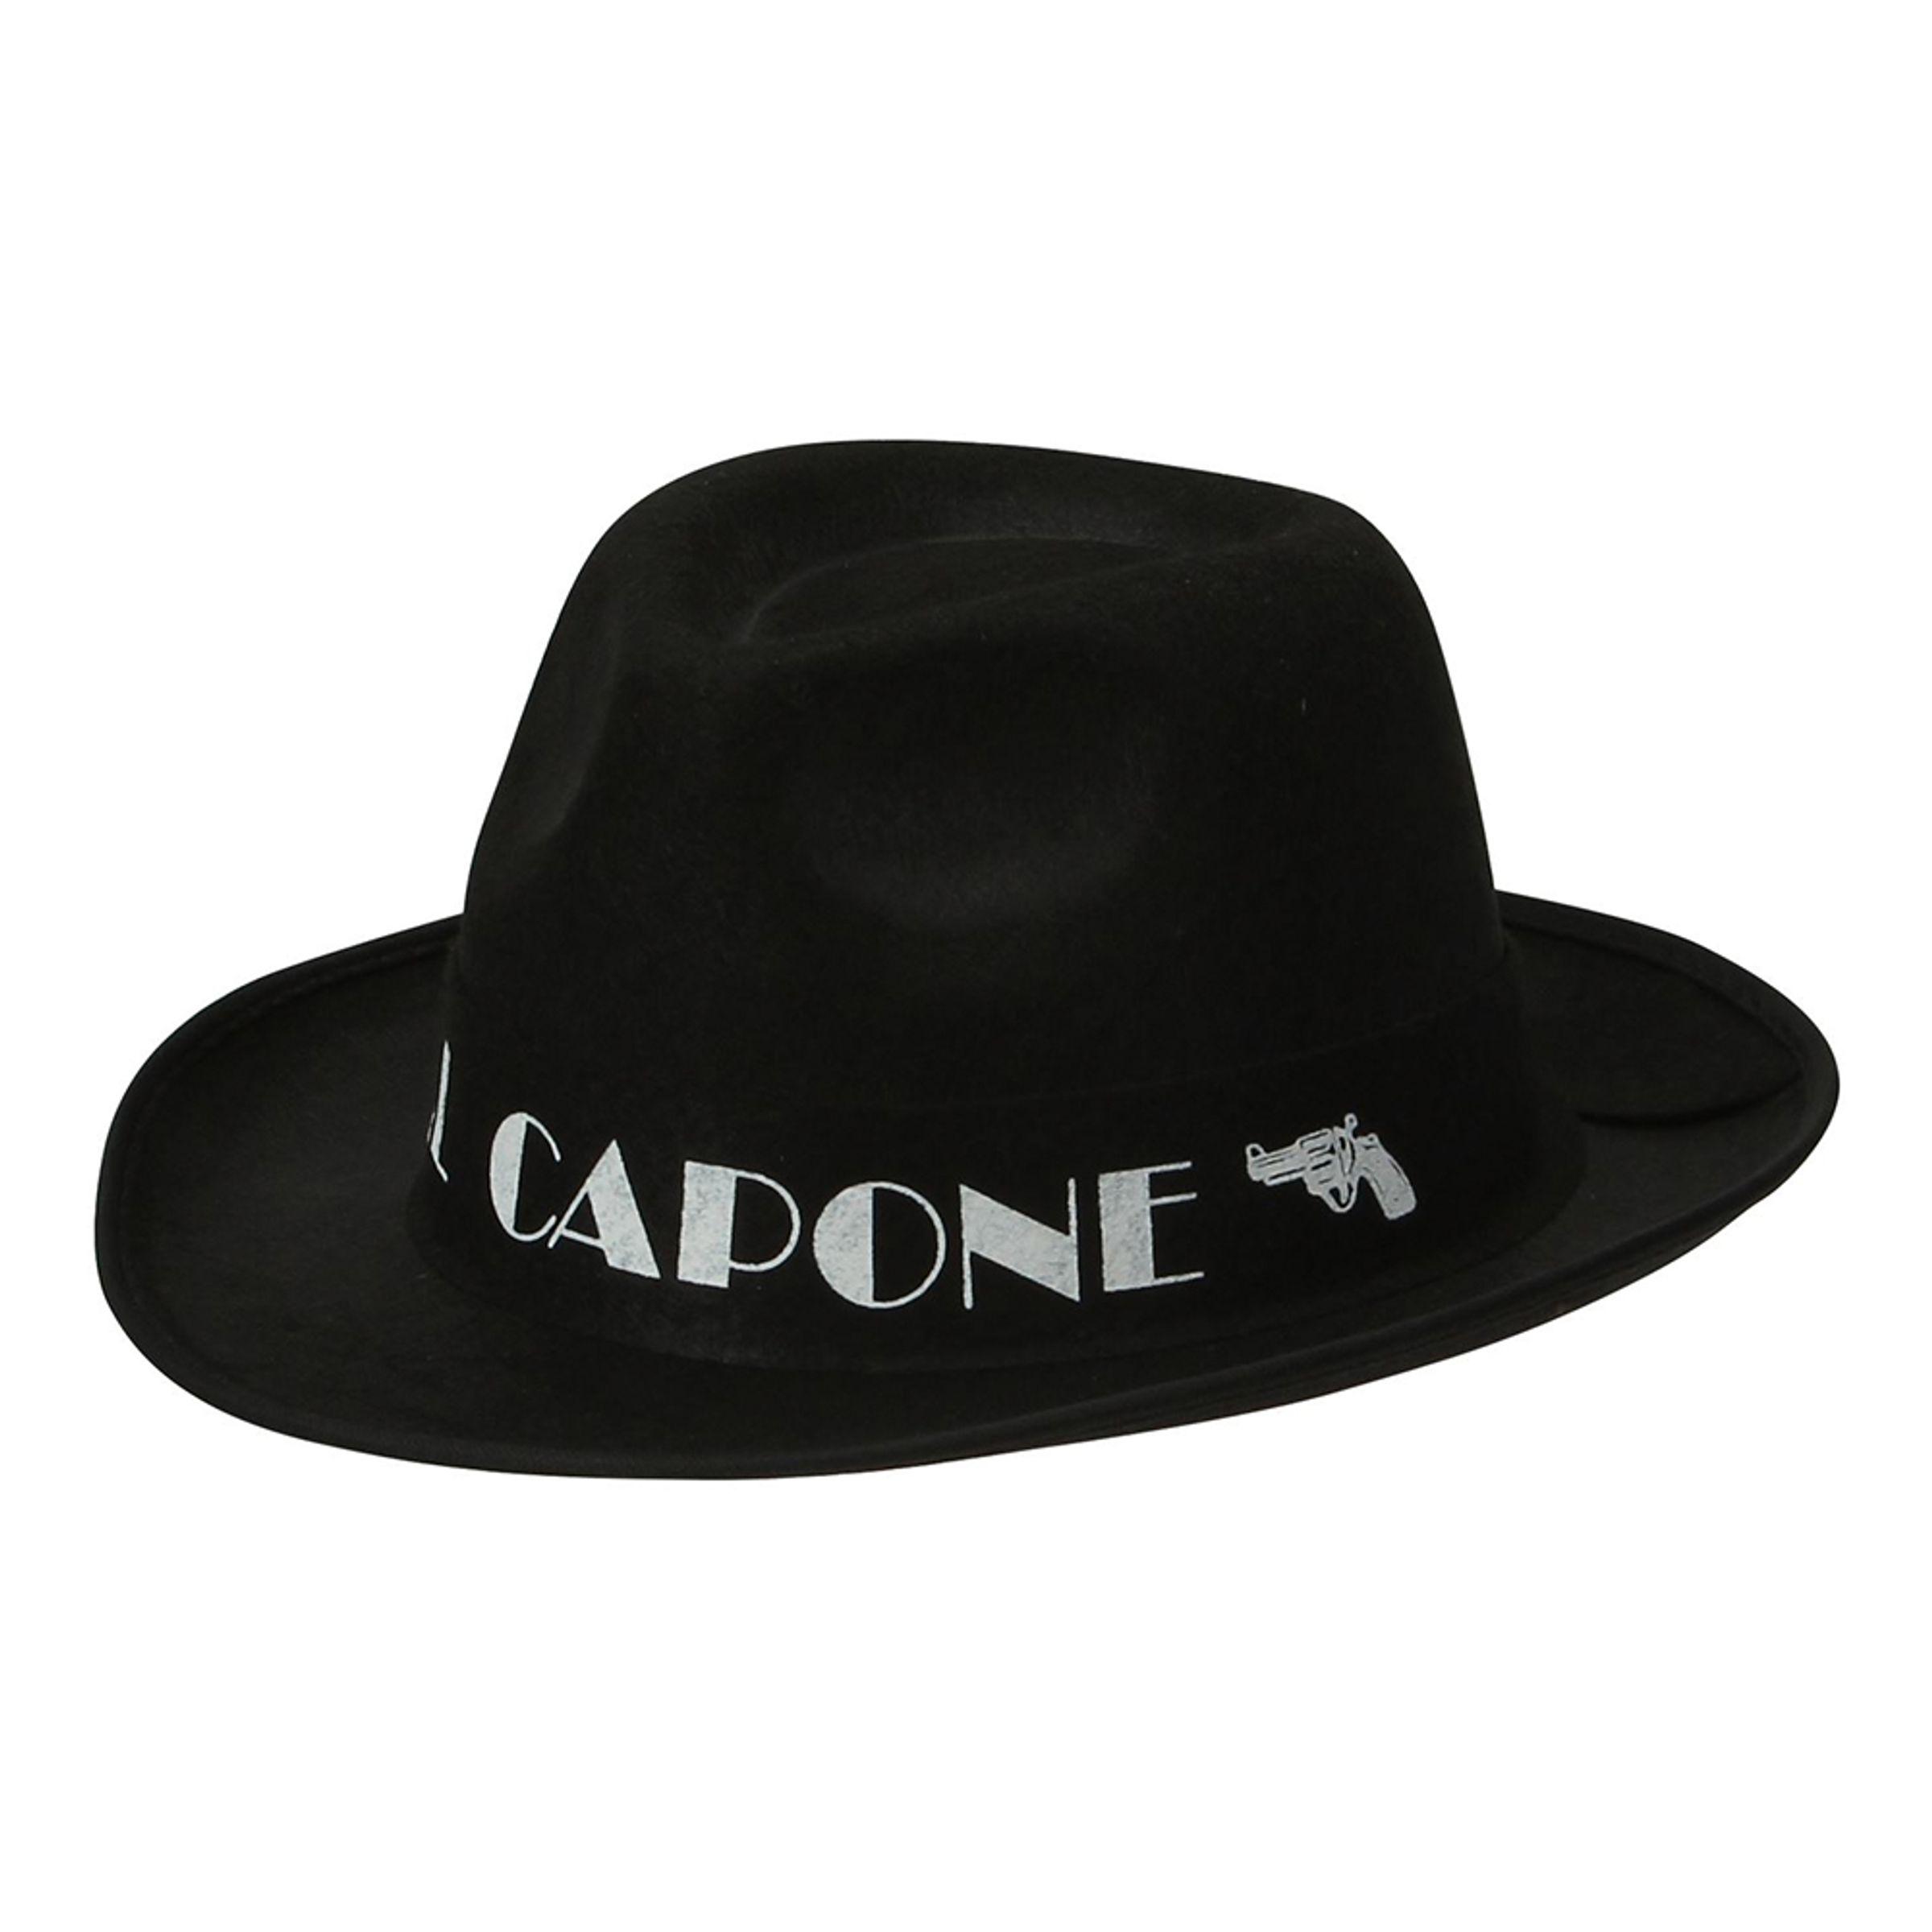 Al Capone Svart Gangsterhatt - One size